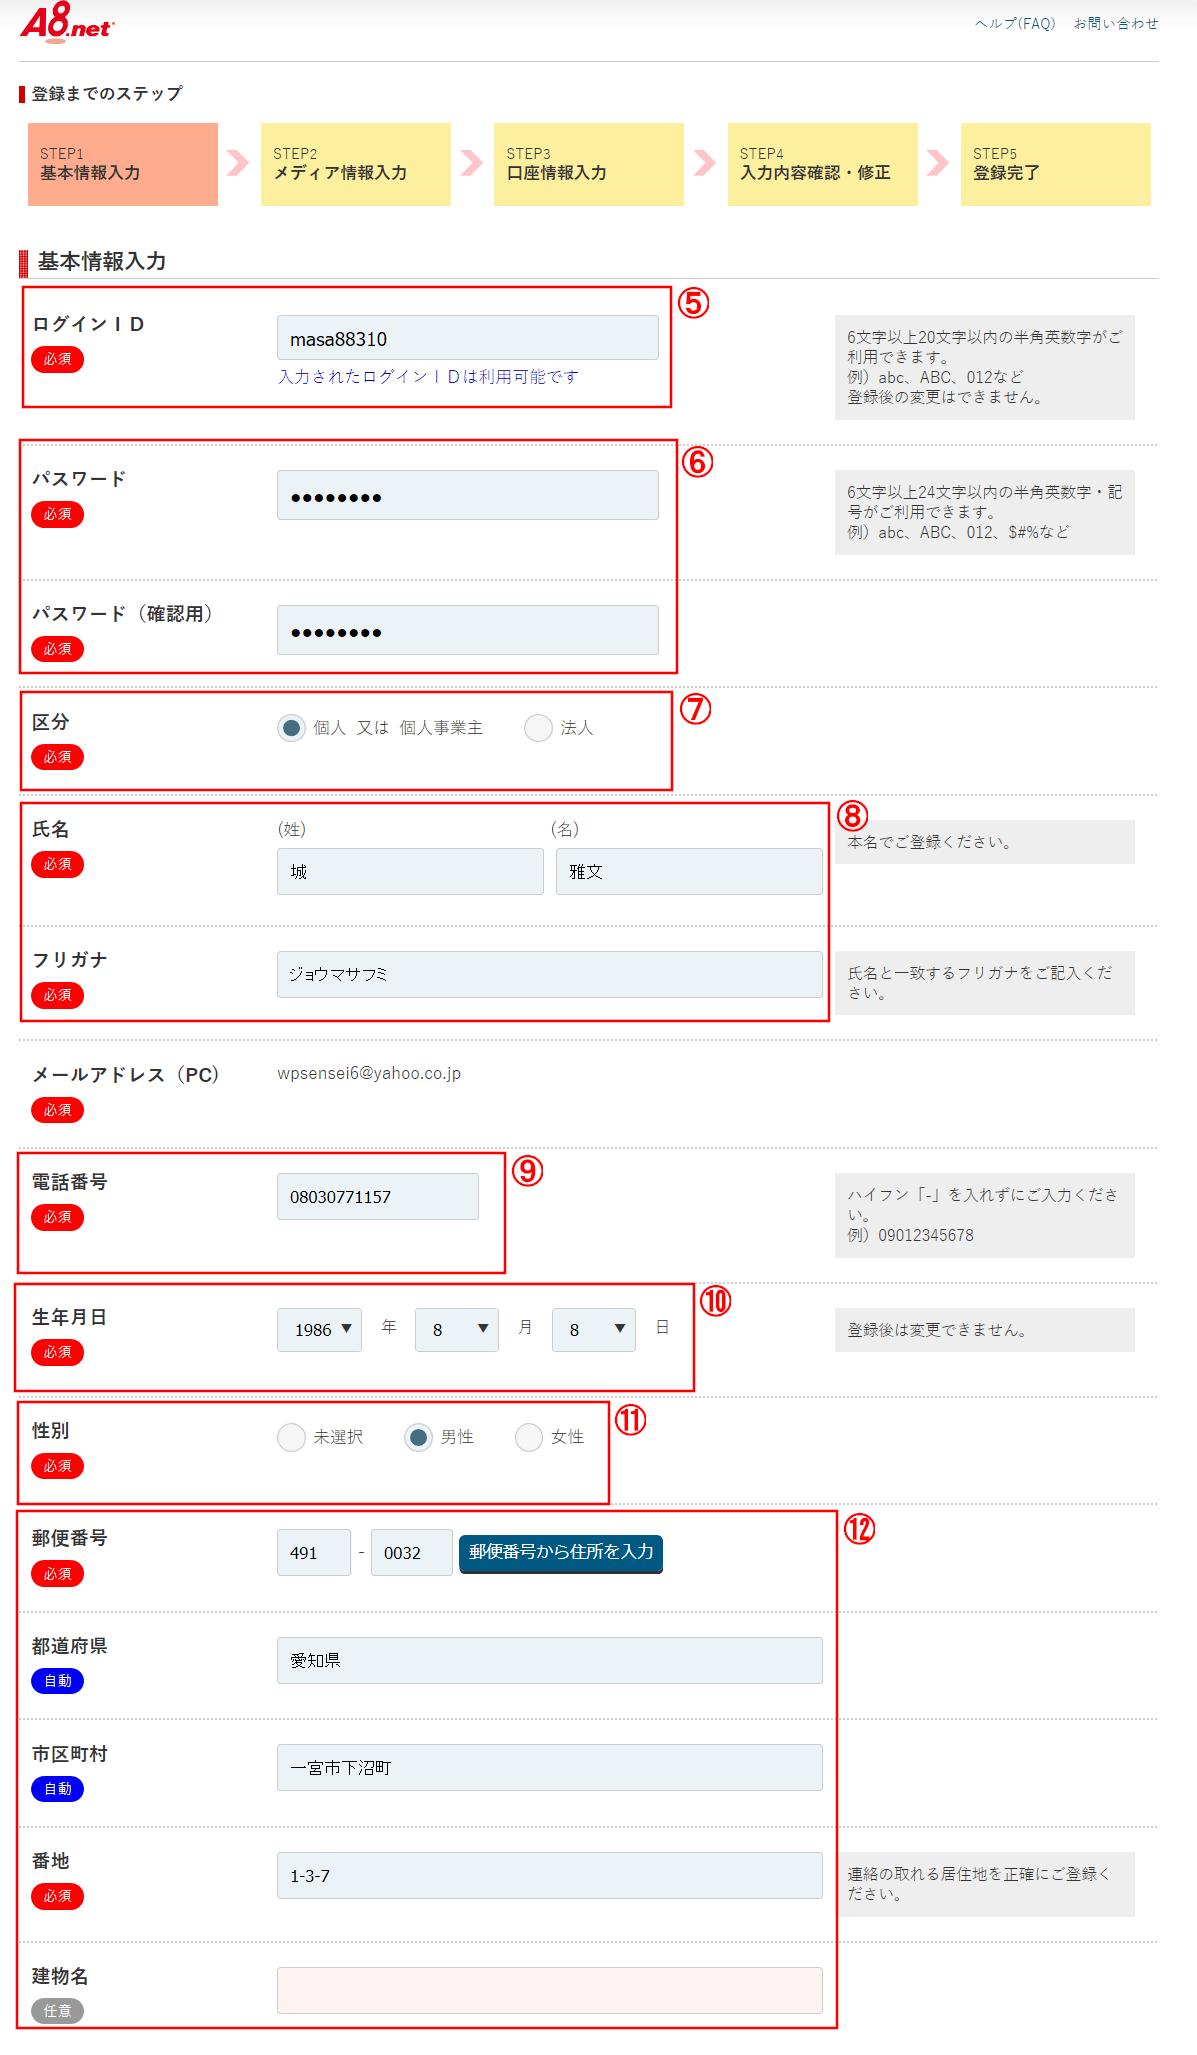 A8net無料会員登録修正版2 (1)